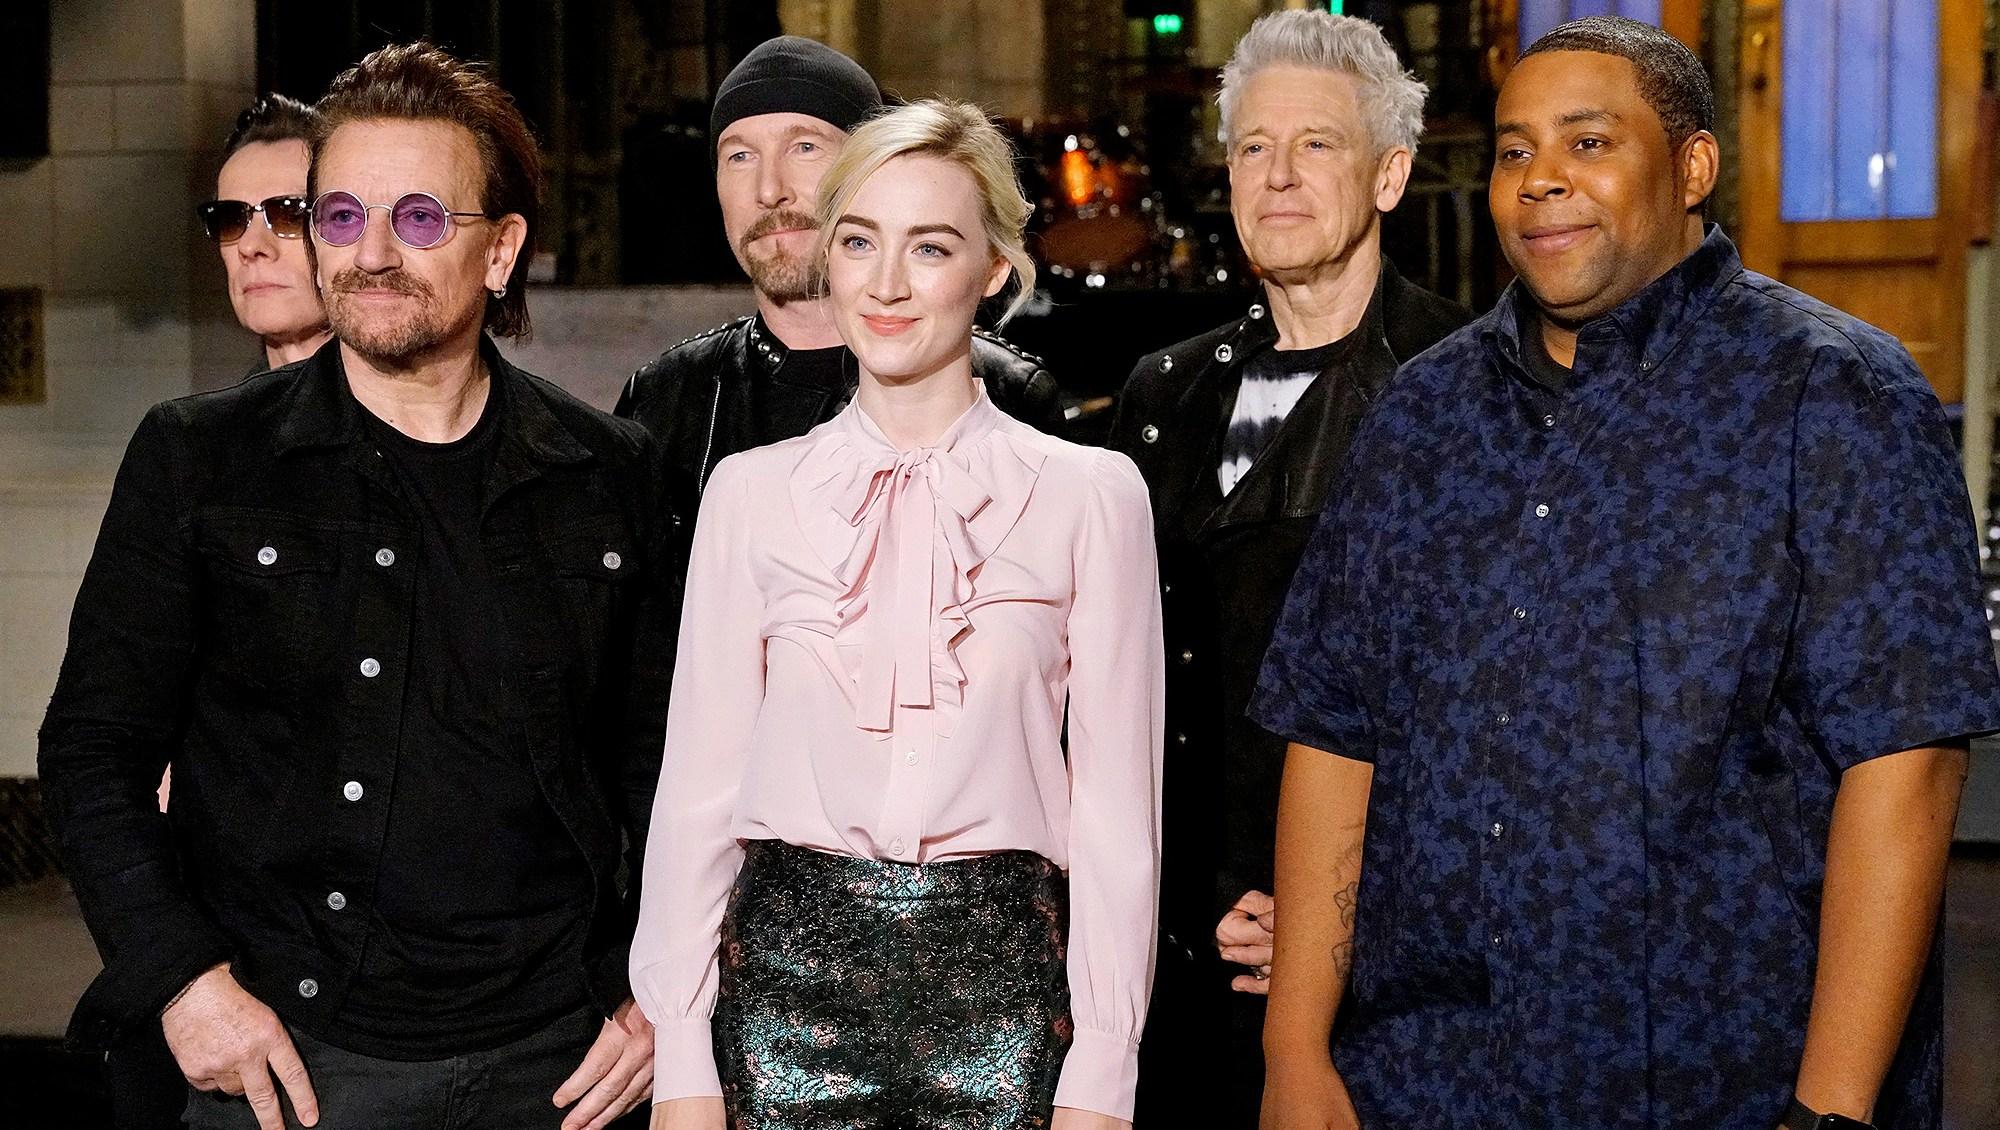 Larry Mullen Jr., Bono, The Edge, Saoirse Ronan, Adam Clayton, Kenan Thompson, U2, Saturday Night Live